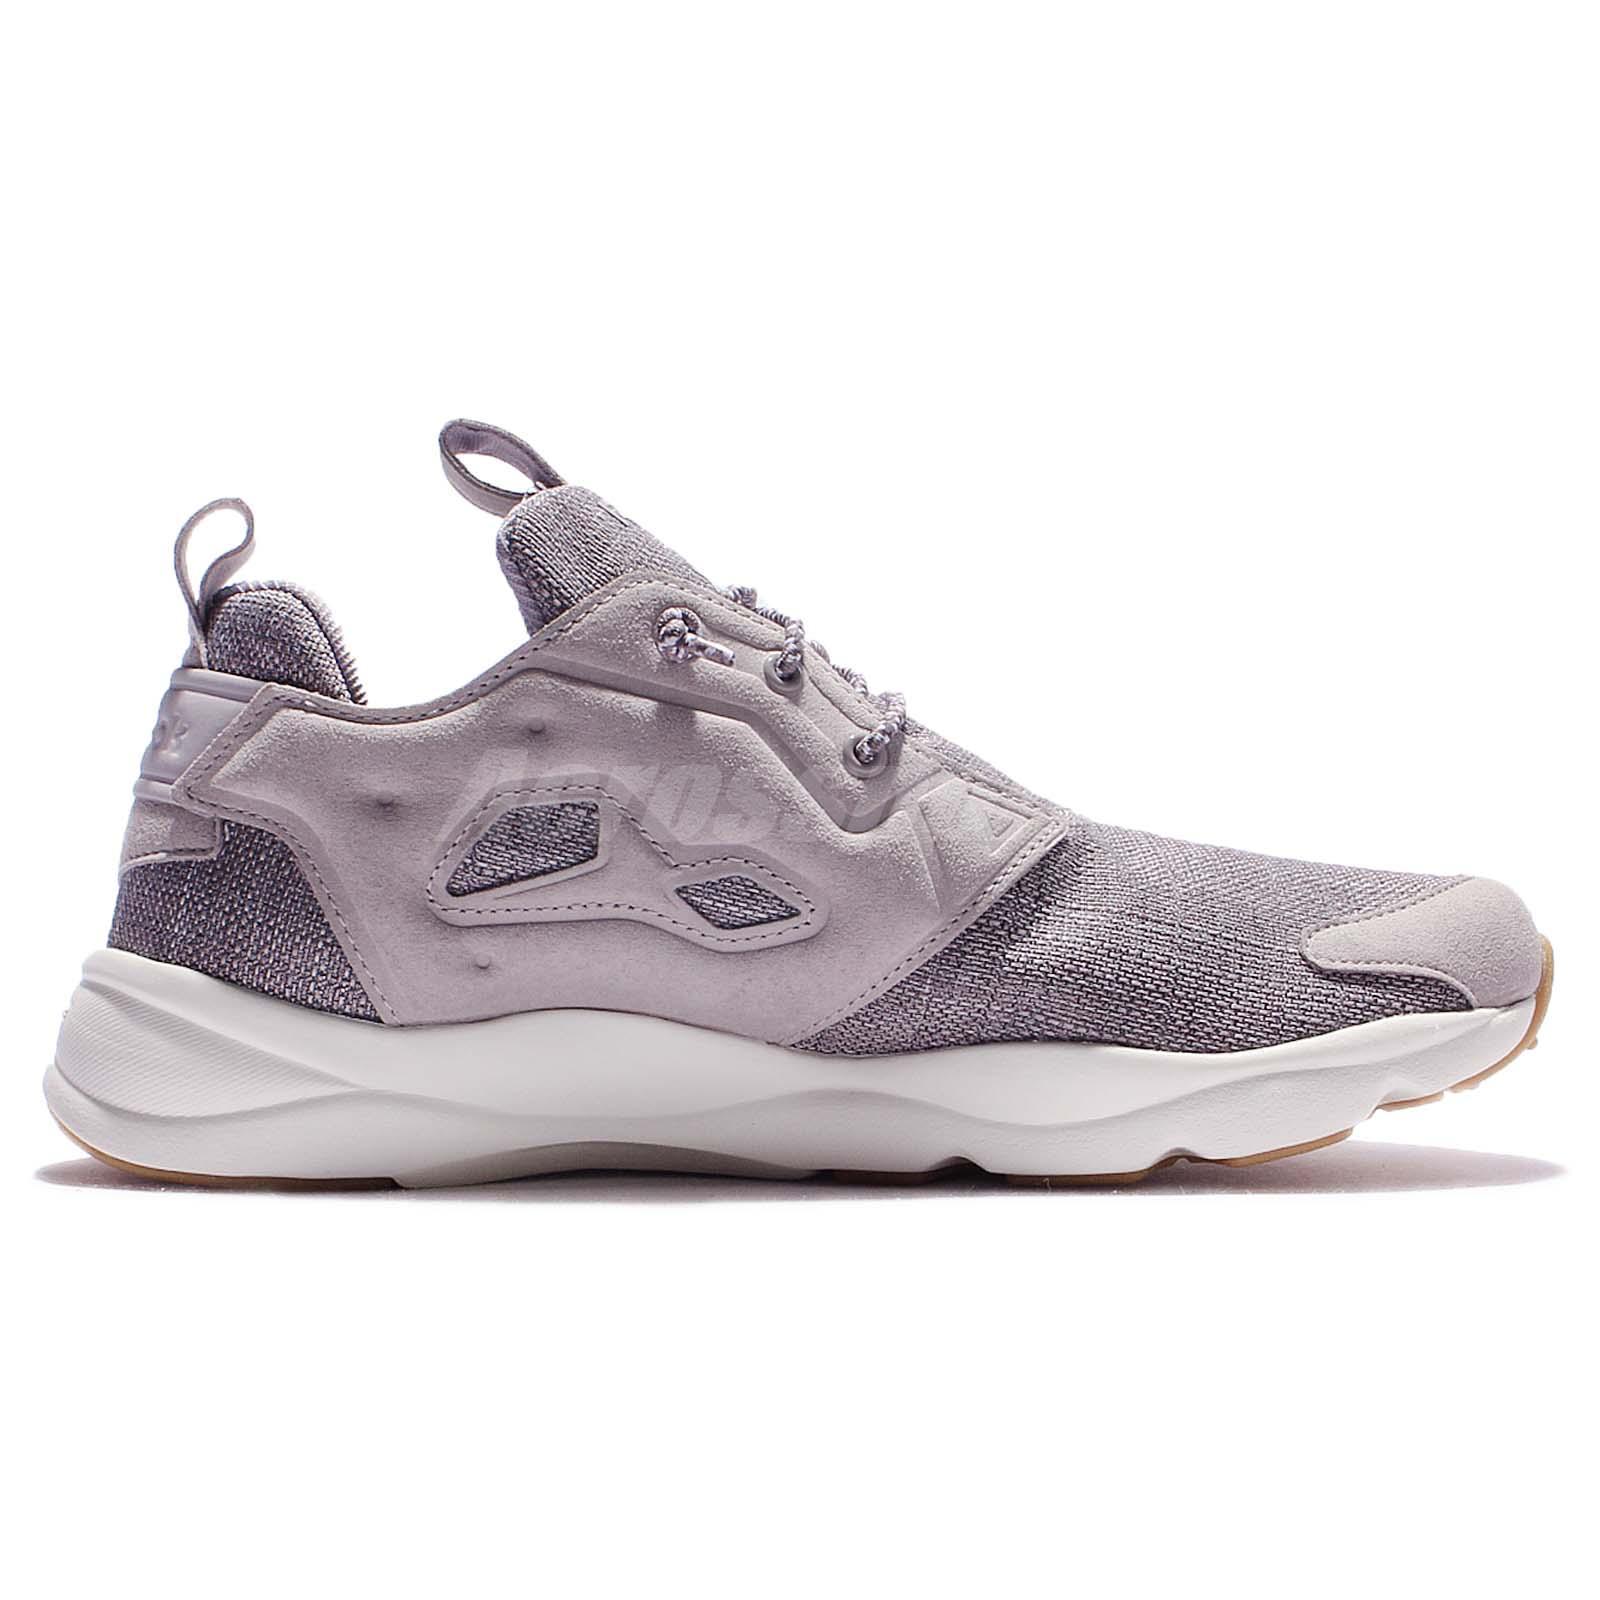 4cbc7eb69b5bea ... Reebok Furylite Refine Grey Black Gum Men Casual Shoes Sneakers BD3850  Condition  Brand New With Box ...